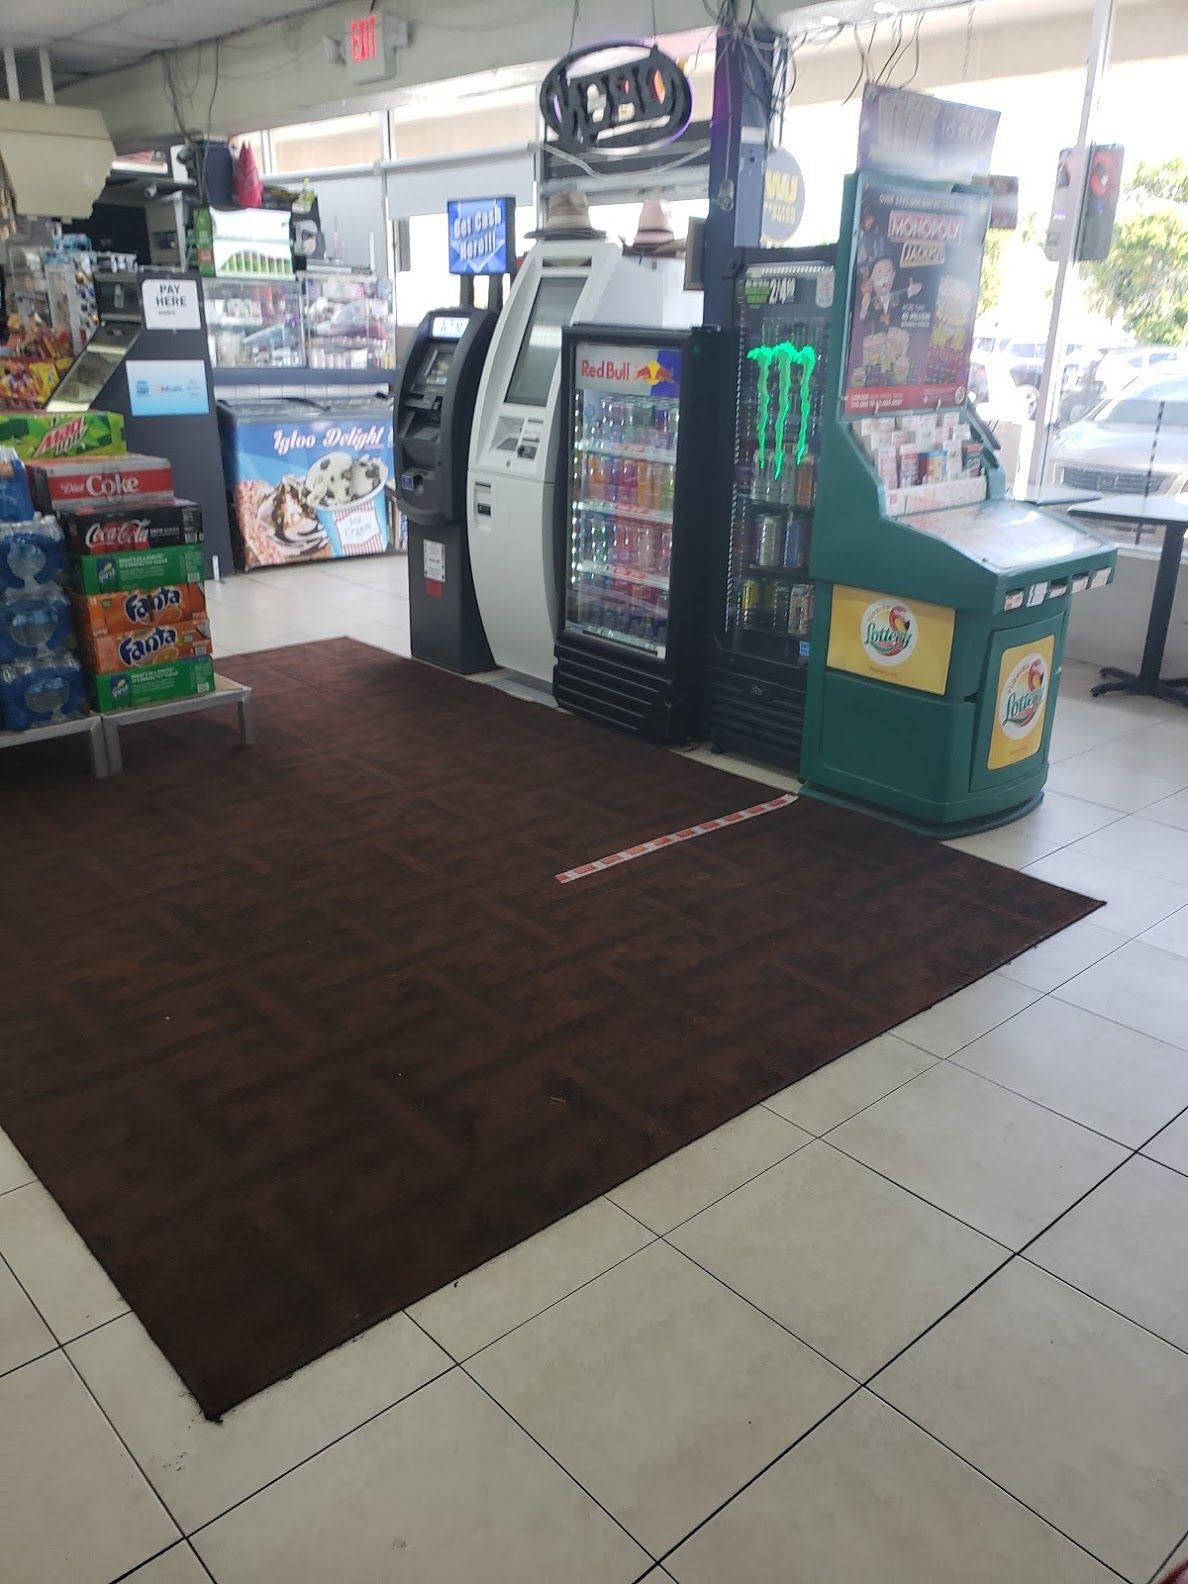 B Kwik Food Store - Coinsource 1